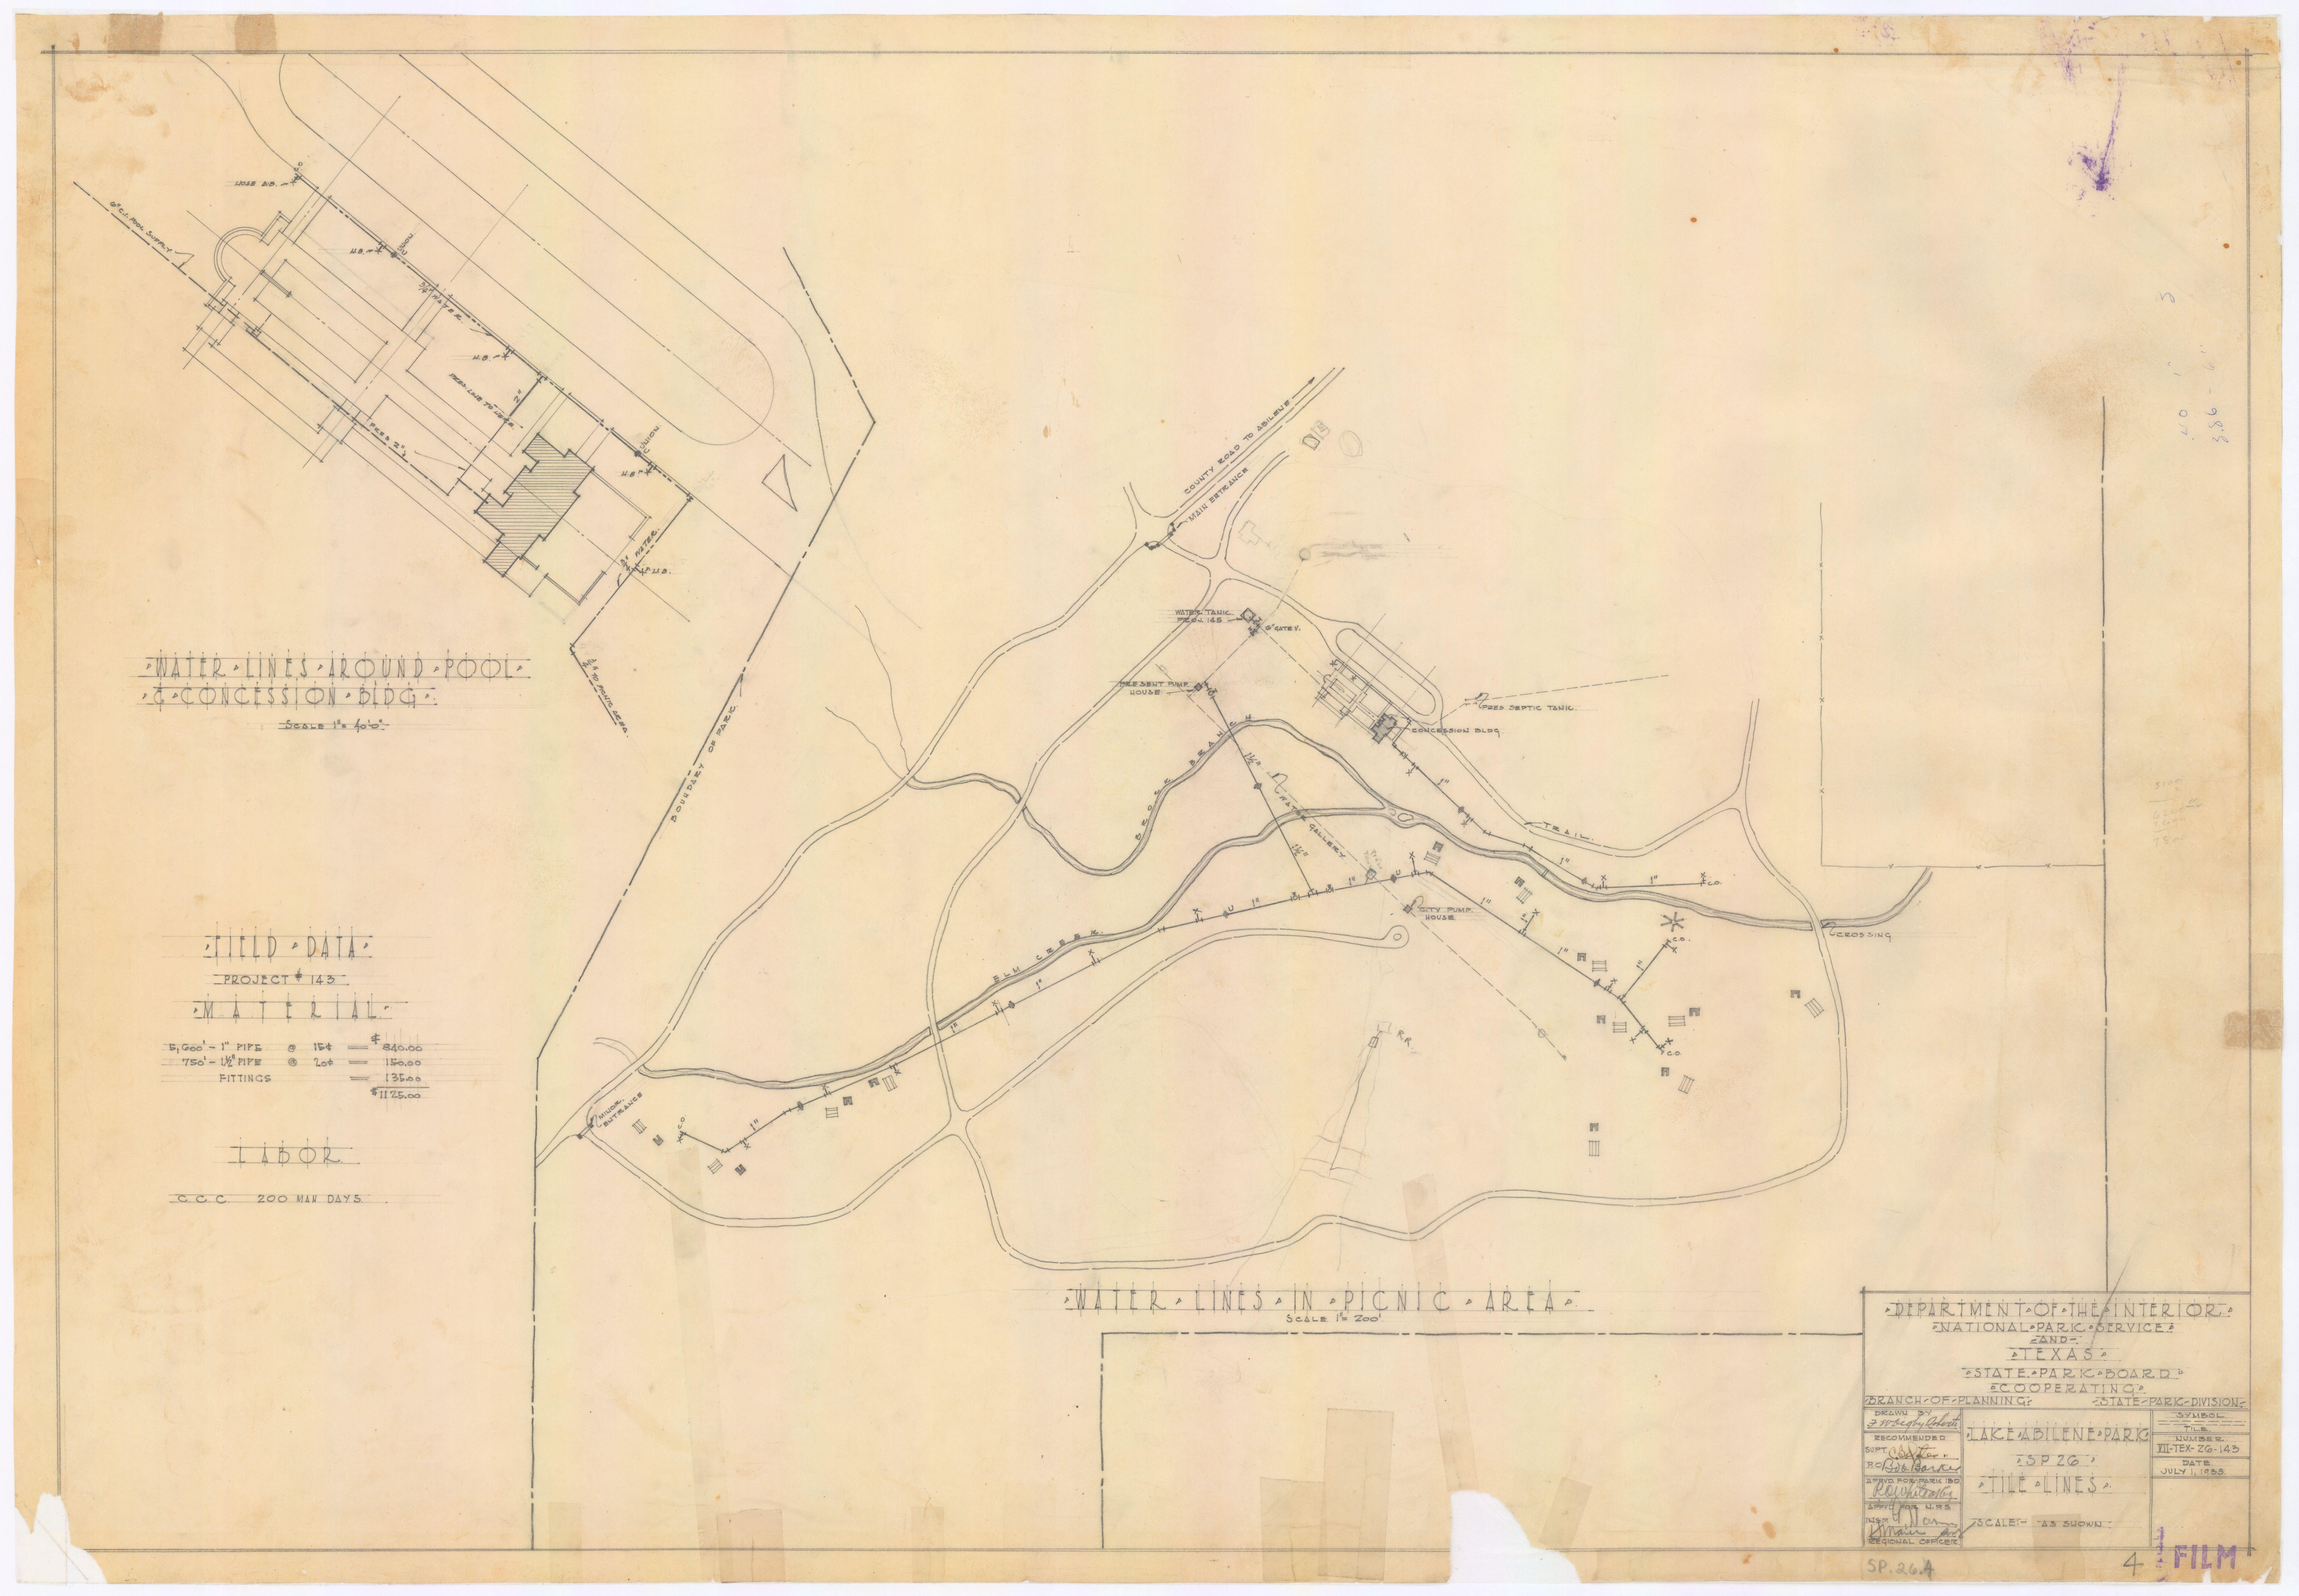 Abilene State Park - Tile Lines & Water Lines - SP.26.4